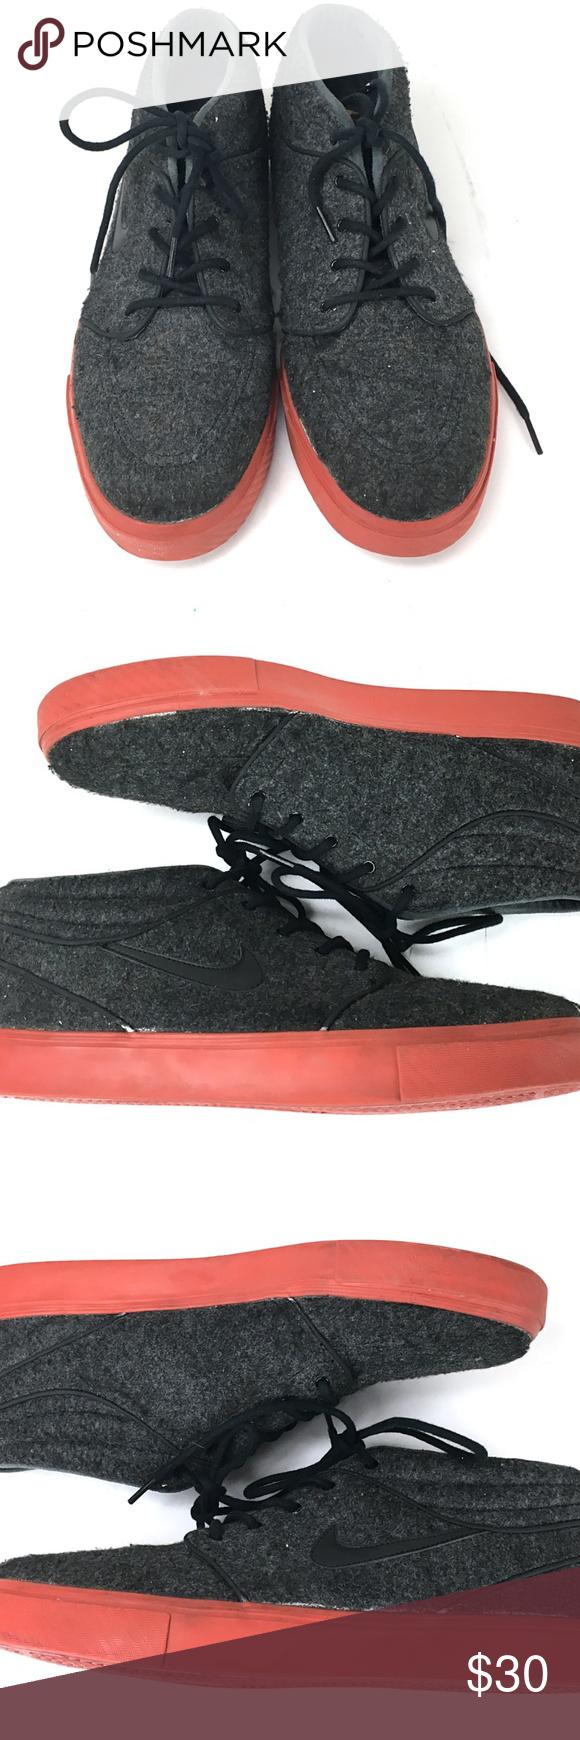 d8f8b16d2615 Nike SB Stefan Janoski Wool Grey Sneakers Pre-owned men s Nike SB Stefan  Janoski mid